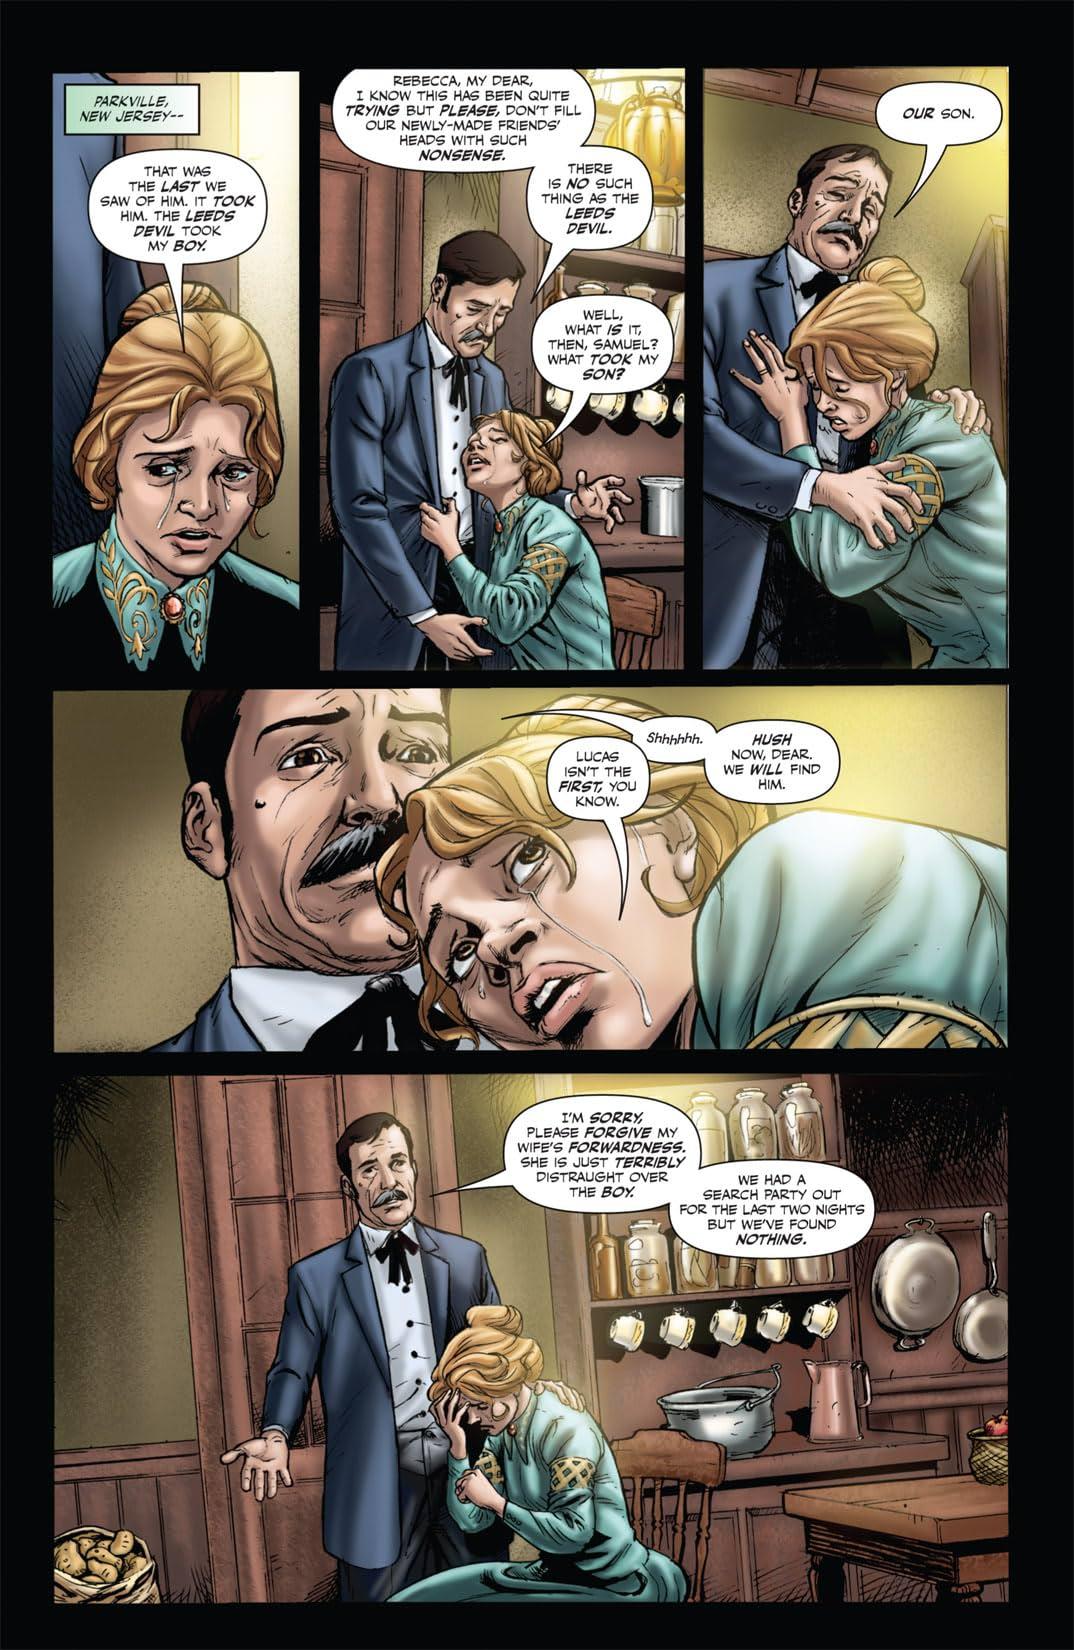 Salem's Daughter #4